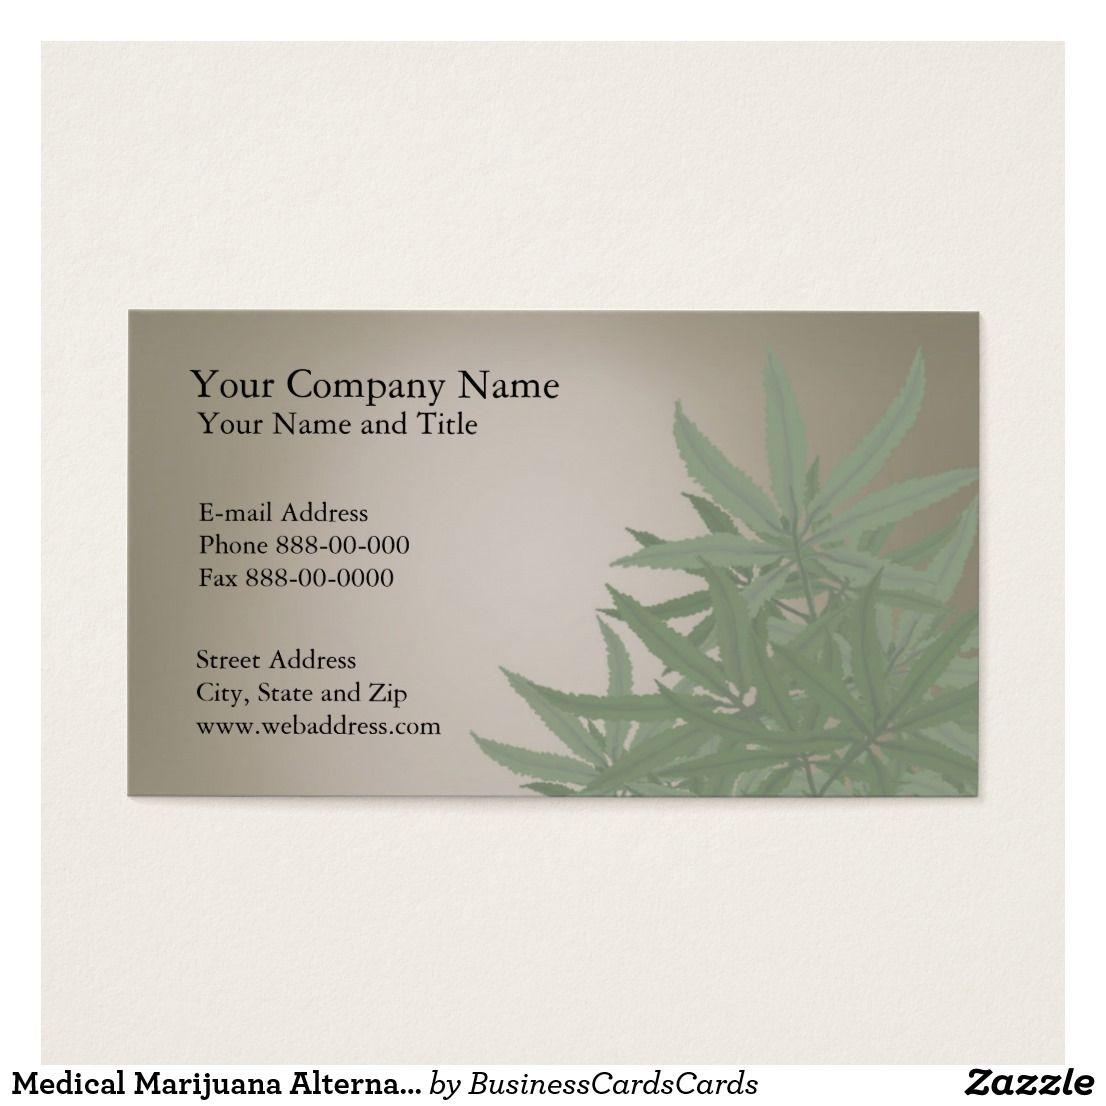 Marijuana cannabis leaf business card cannabis business cards marijuana cannabis leaf business card magicingreecefo Choice Image